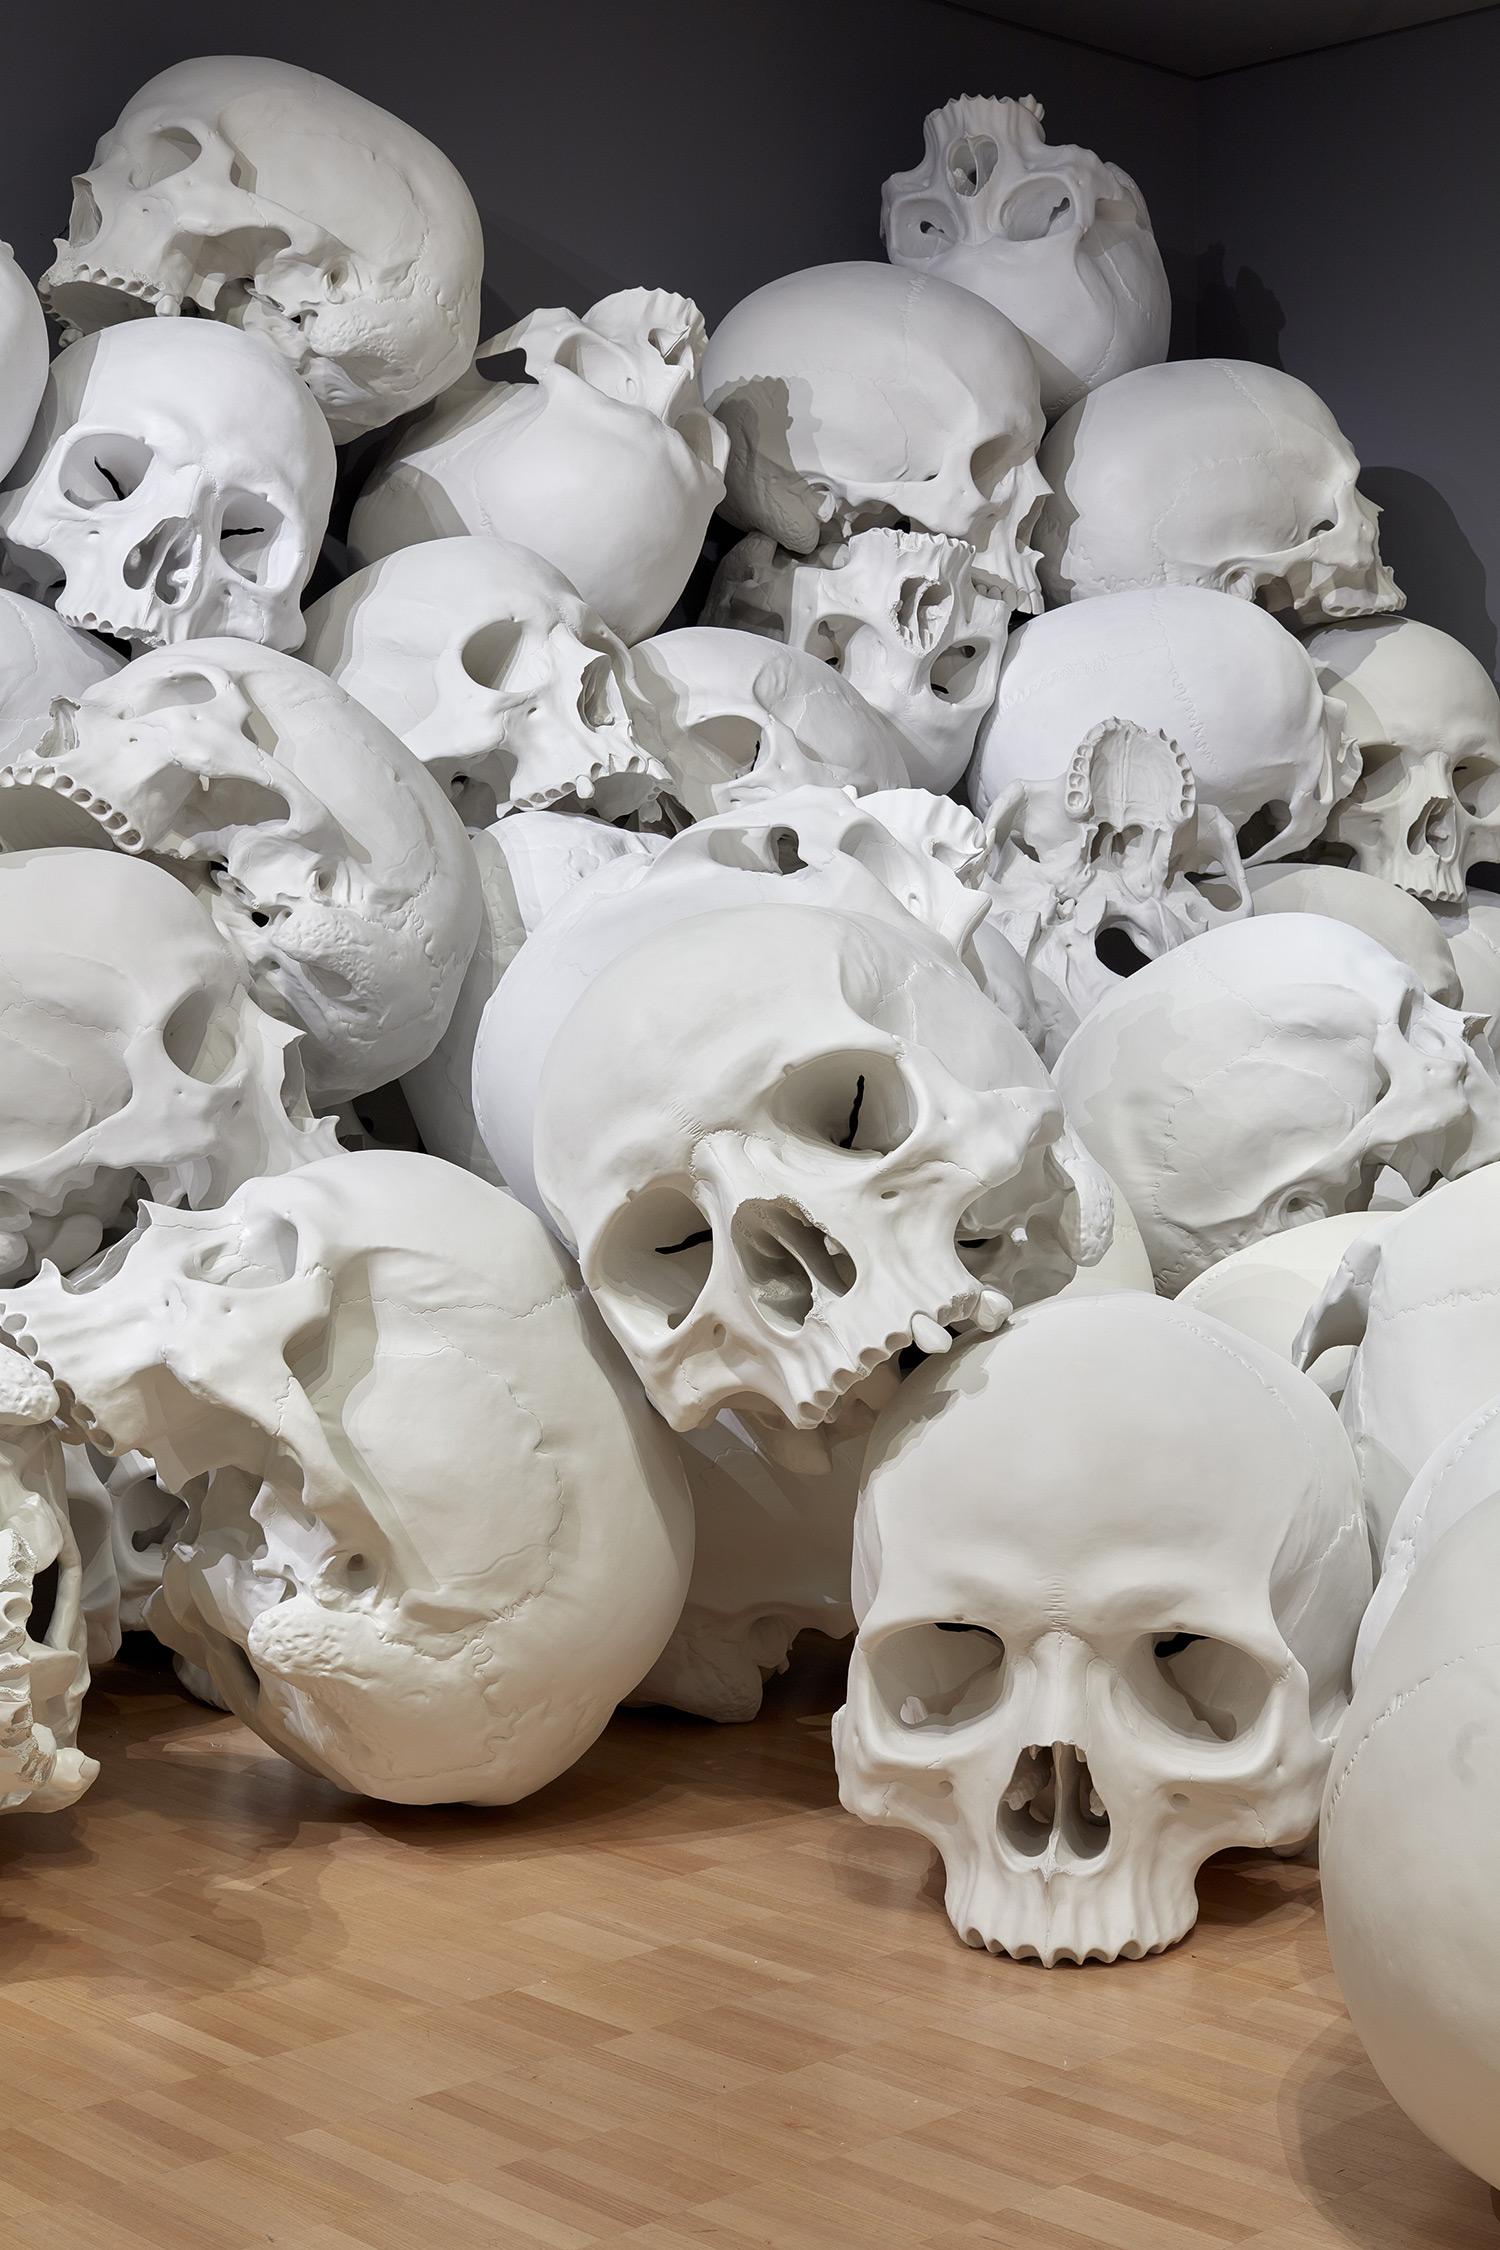 100 Fiberglass And Resin Skulls Fill A Room At The